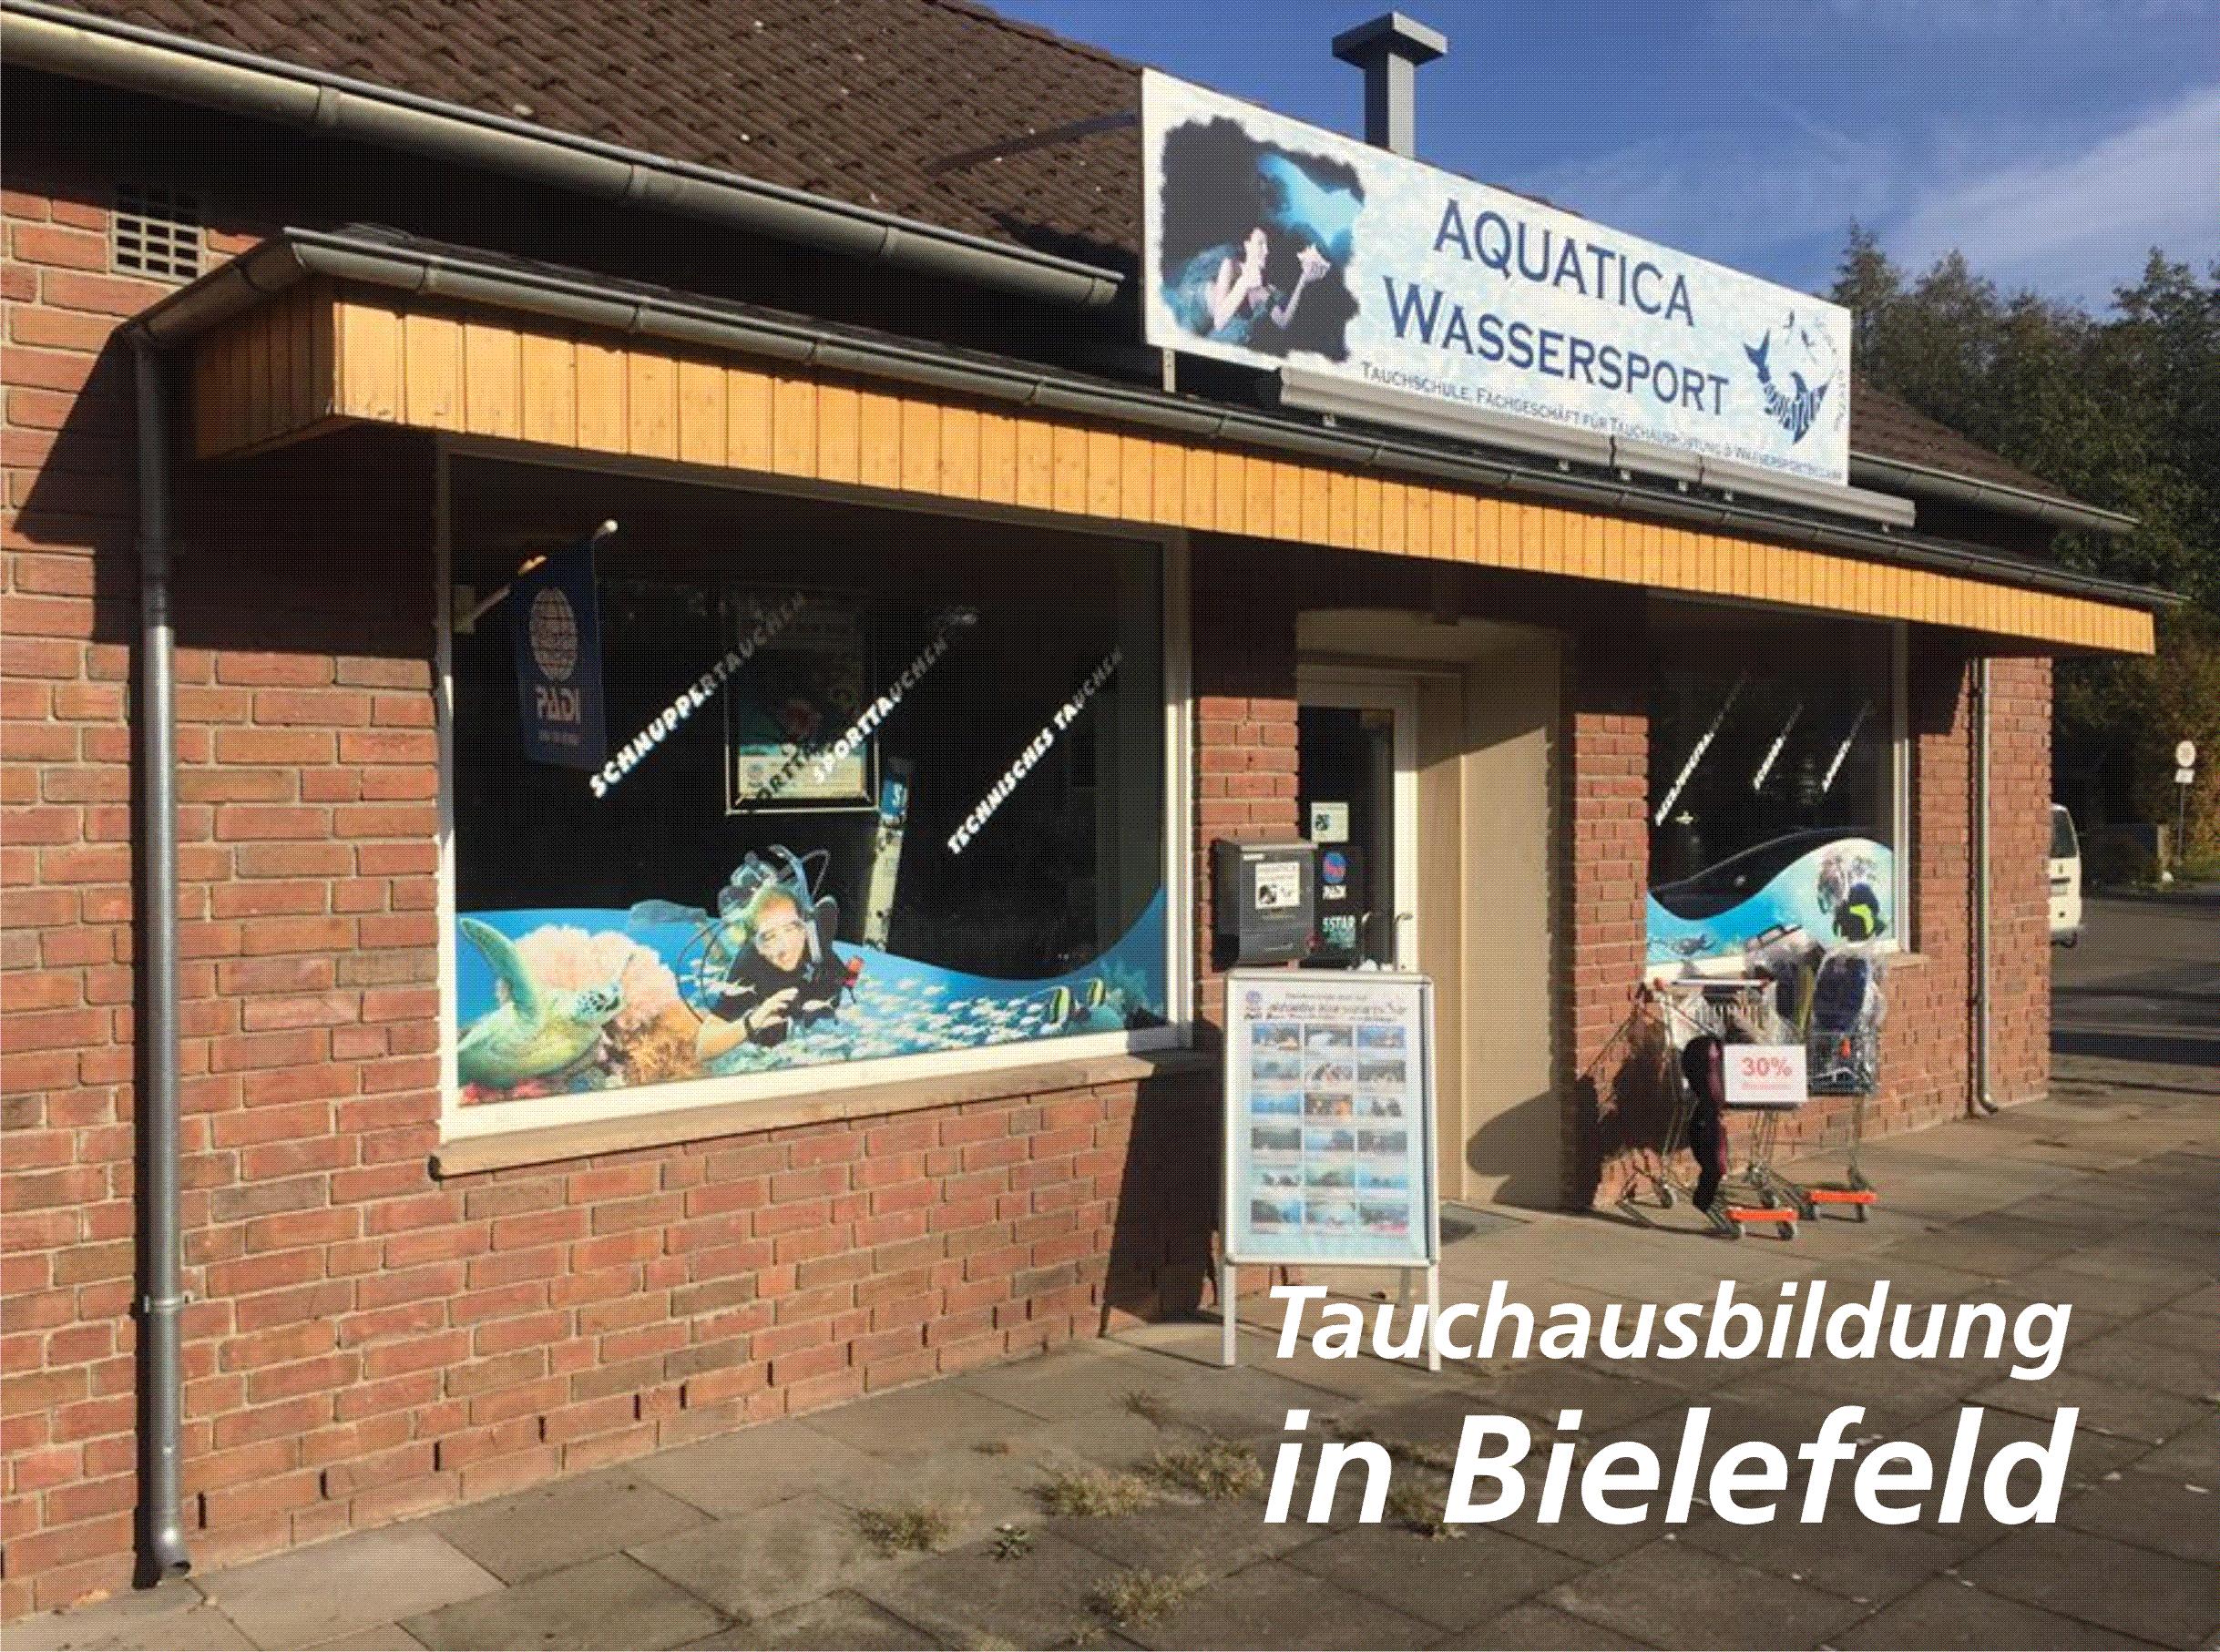 Aquatica Wassersport (Bielefeld)